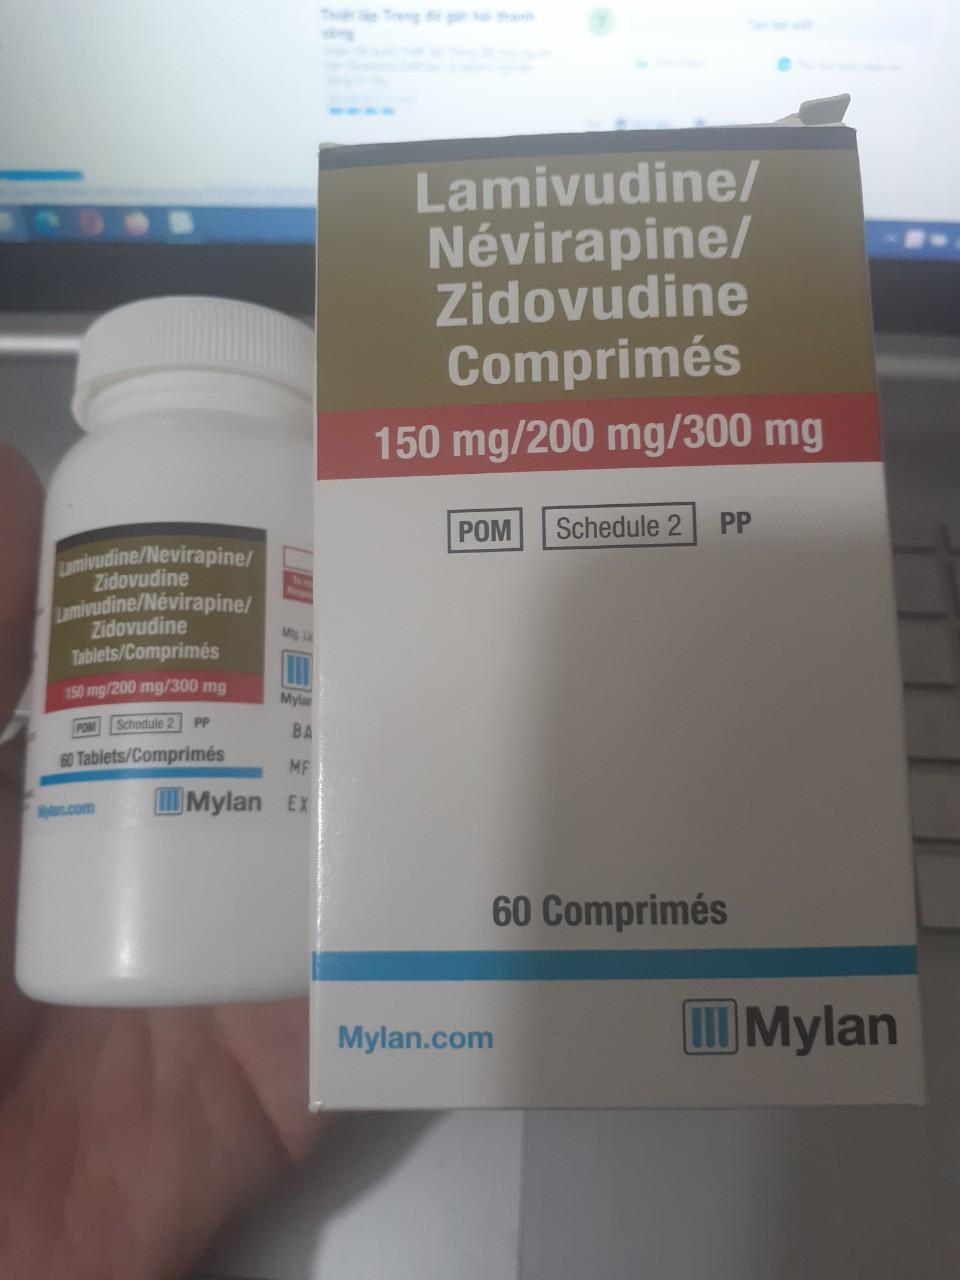 Thuoc-Lamivudine-Nevirapine-Zidovudine-150mg-200mg-300mg-01